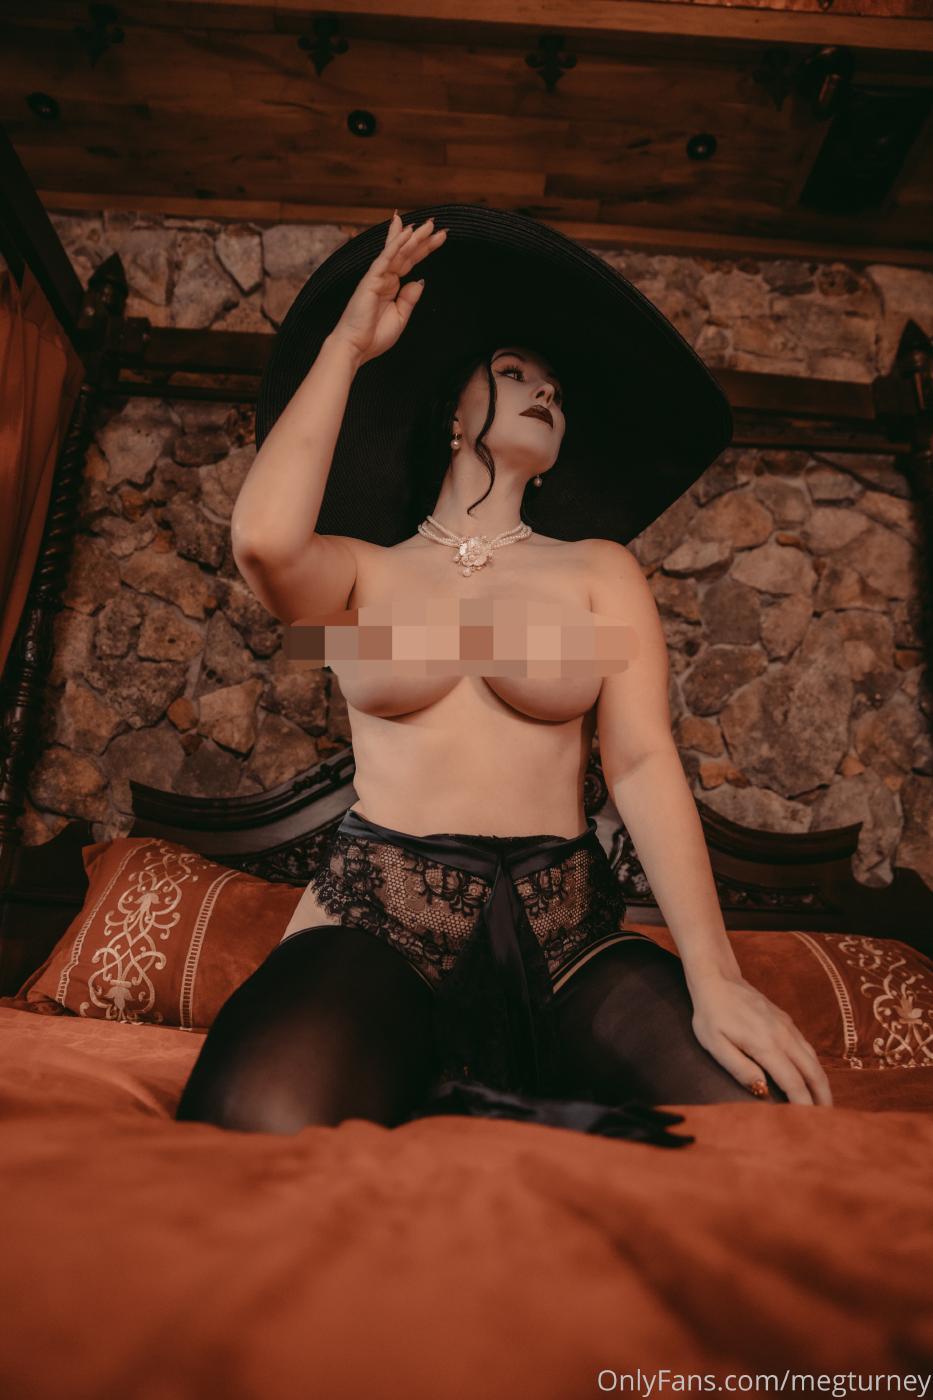 Meg Turney Lady Dimitrescu Cosplay Onlyfans Set Leaked 0024